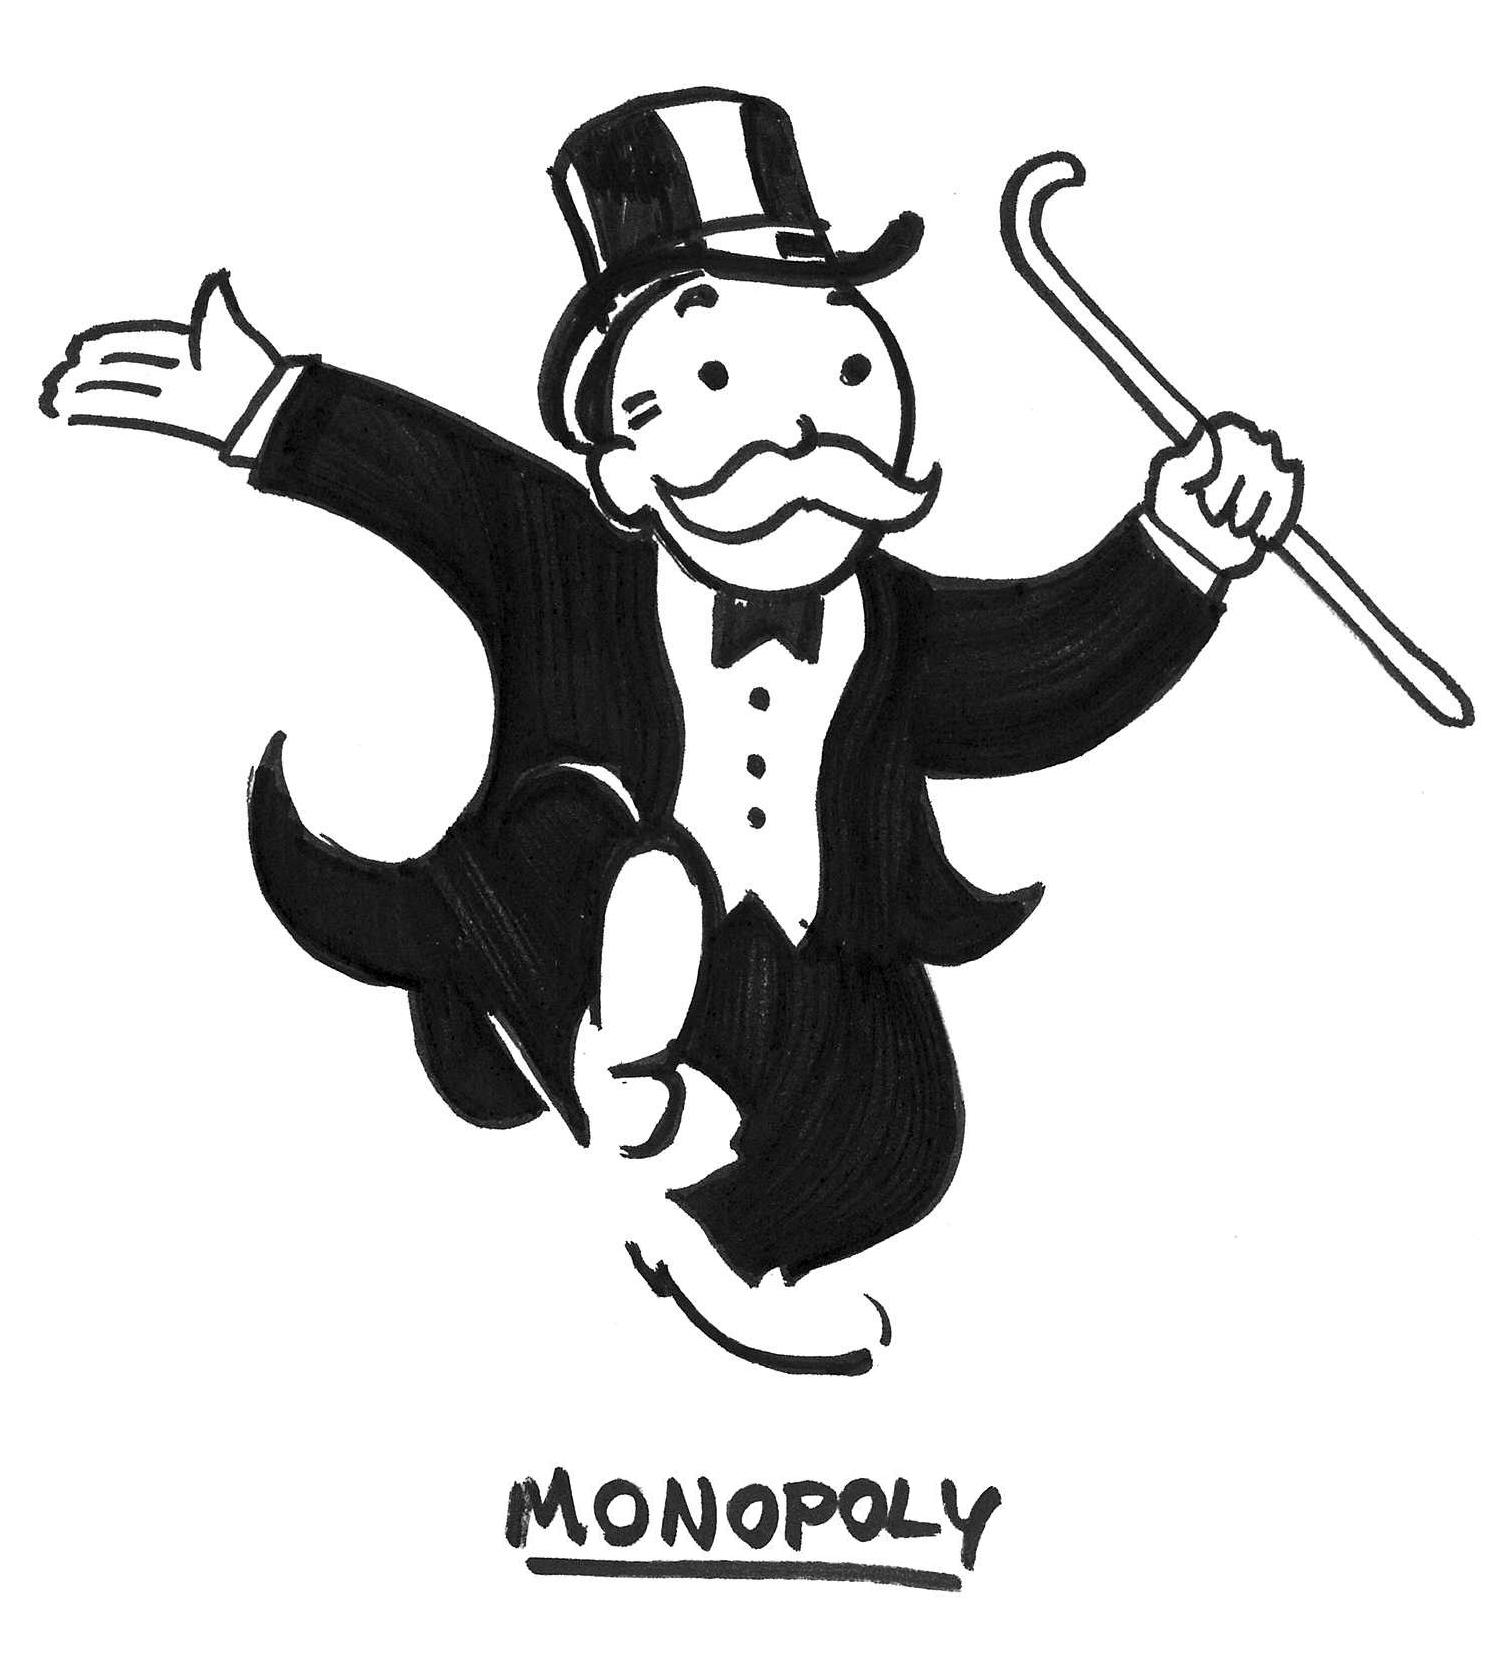 05_3_monopoly.jpg